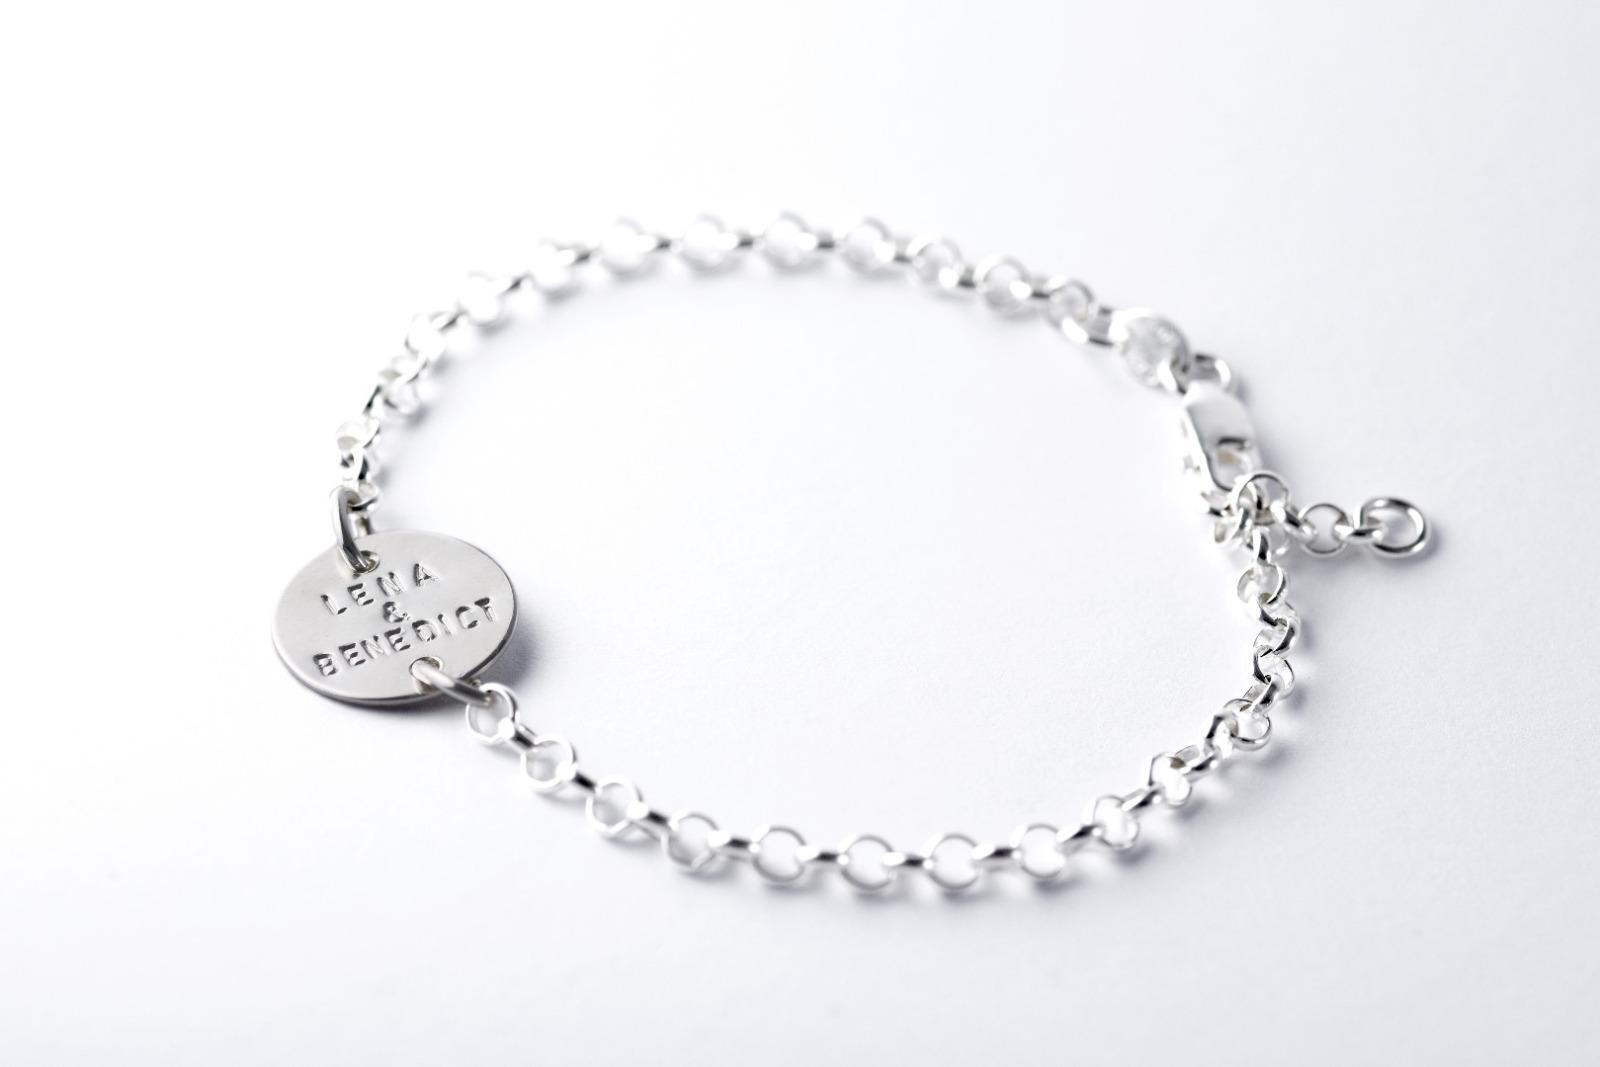 Silberarmband - Namens- Geburts- Spruchband 2